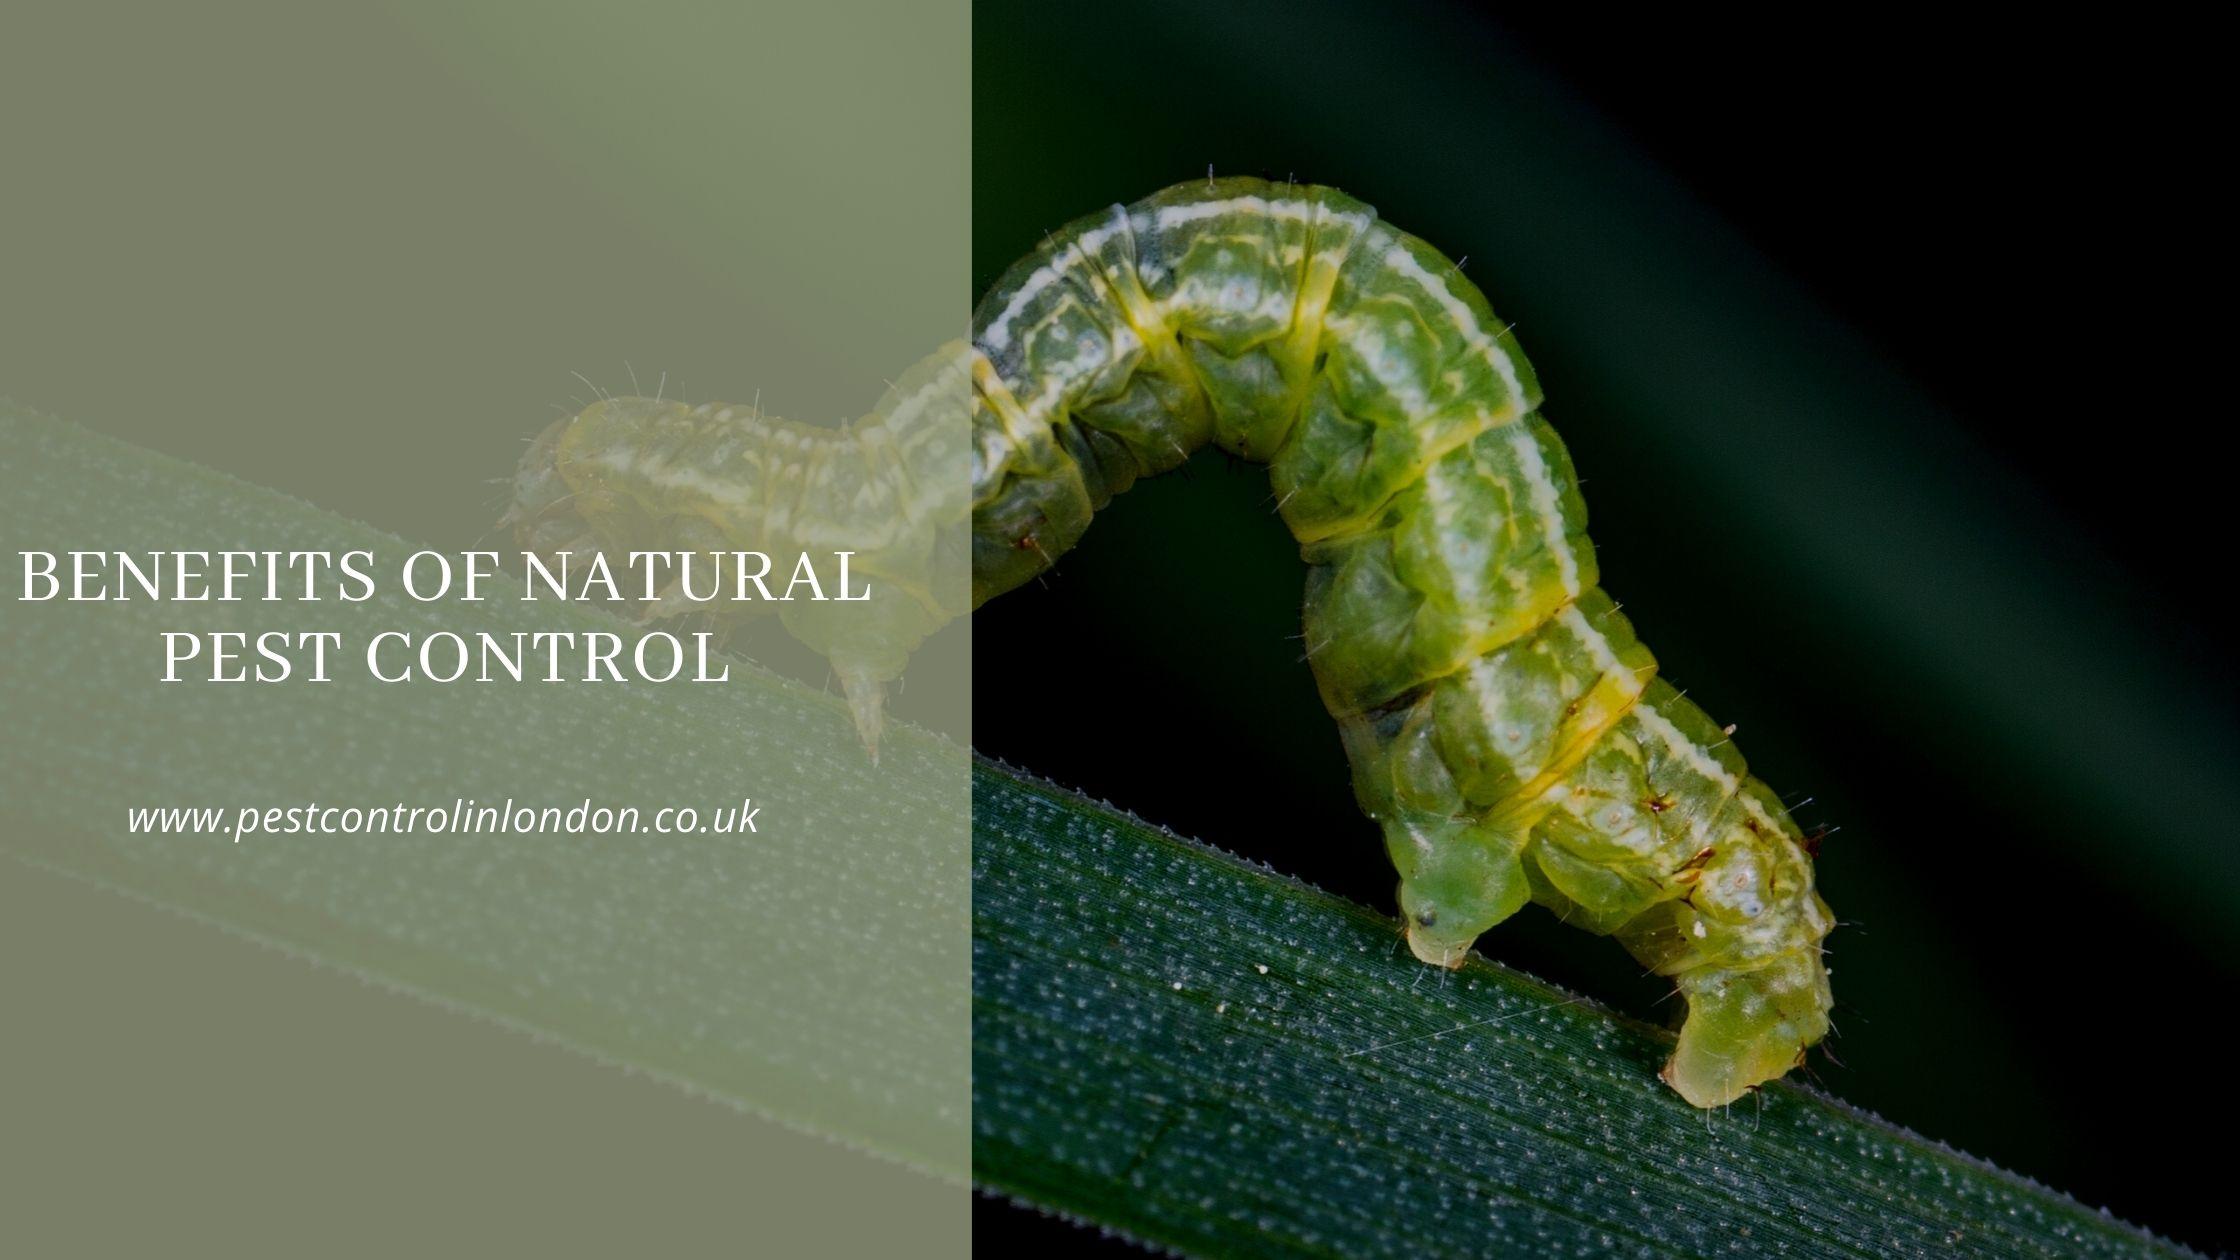 Benefits of Natural Pest control